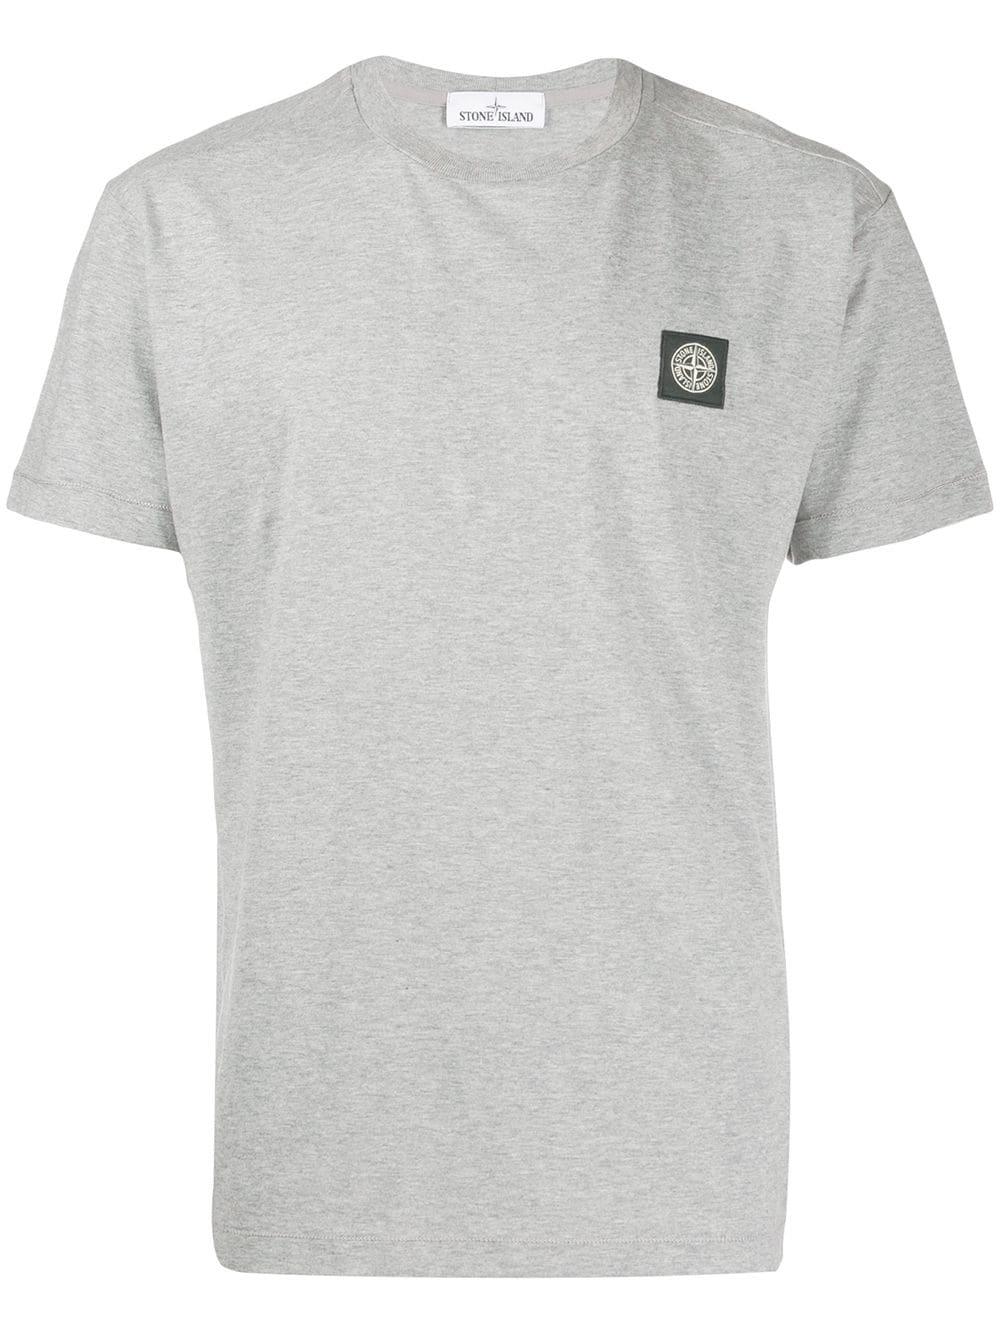 Stone Island Stone Island Logo Patch T Shirt Grey Stoneisland Cloth Shirts Grey Patch Logo Stone Island